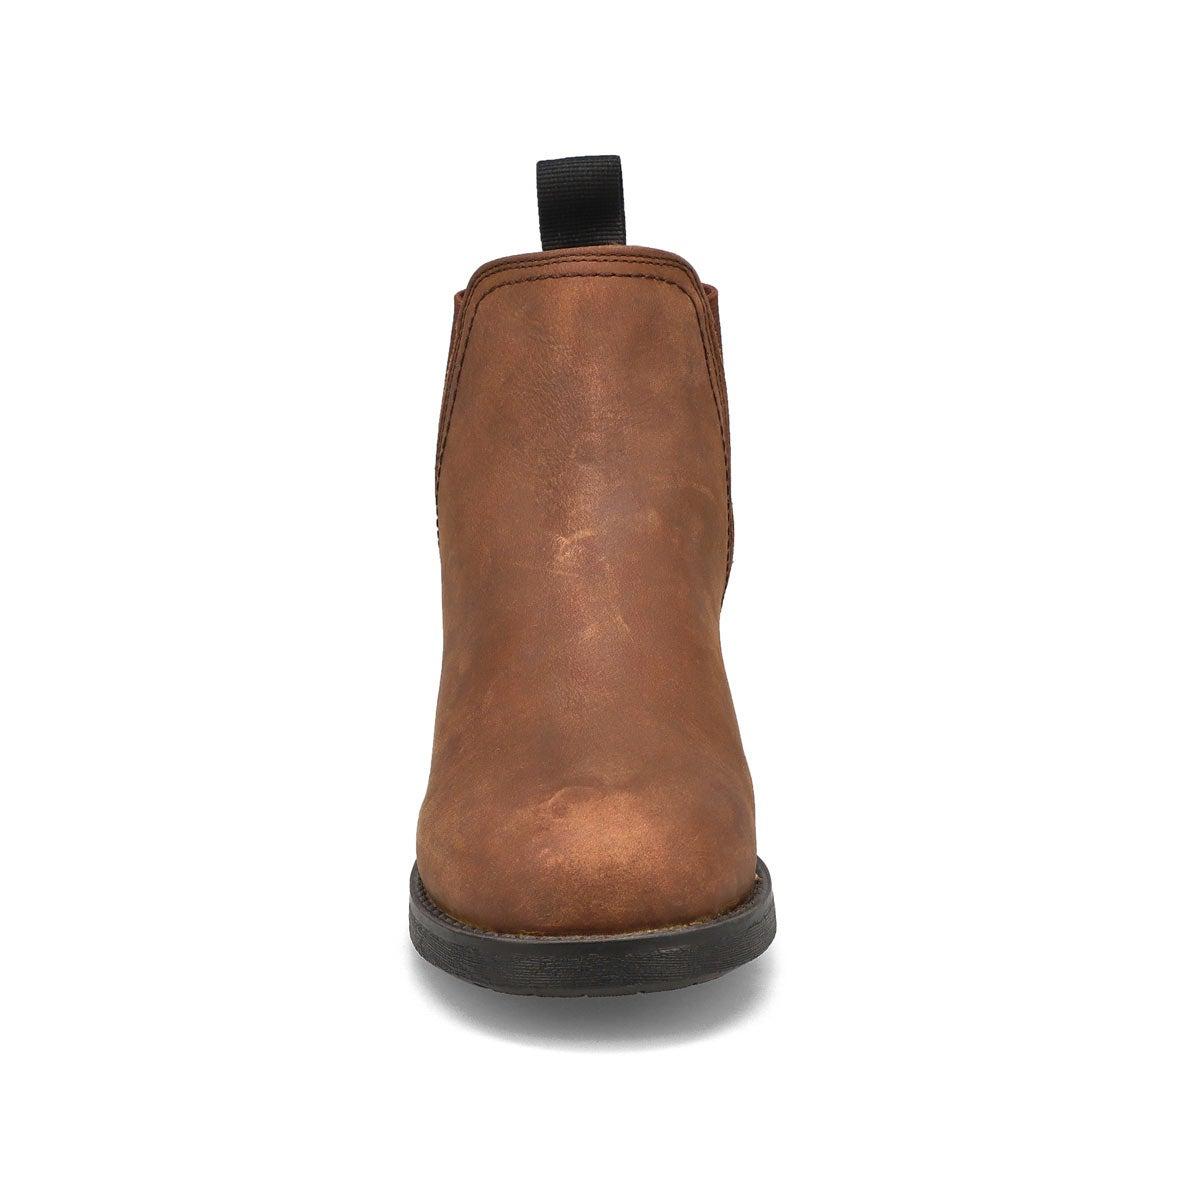 Women's CERSEI brown chelsea boots